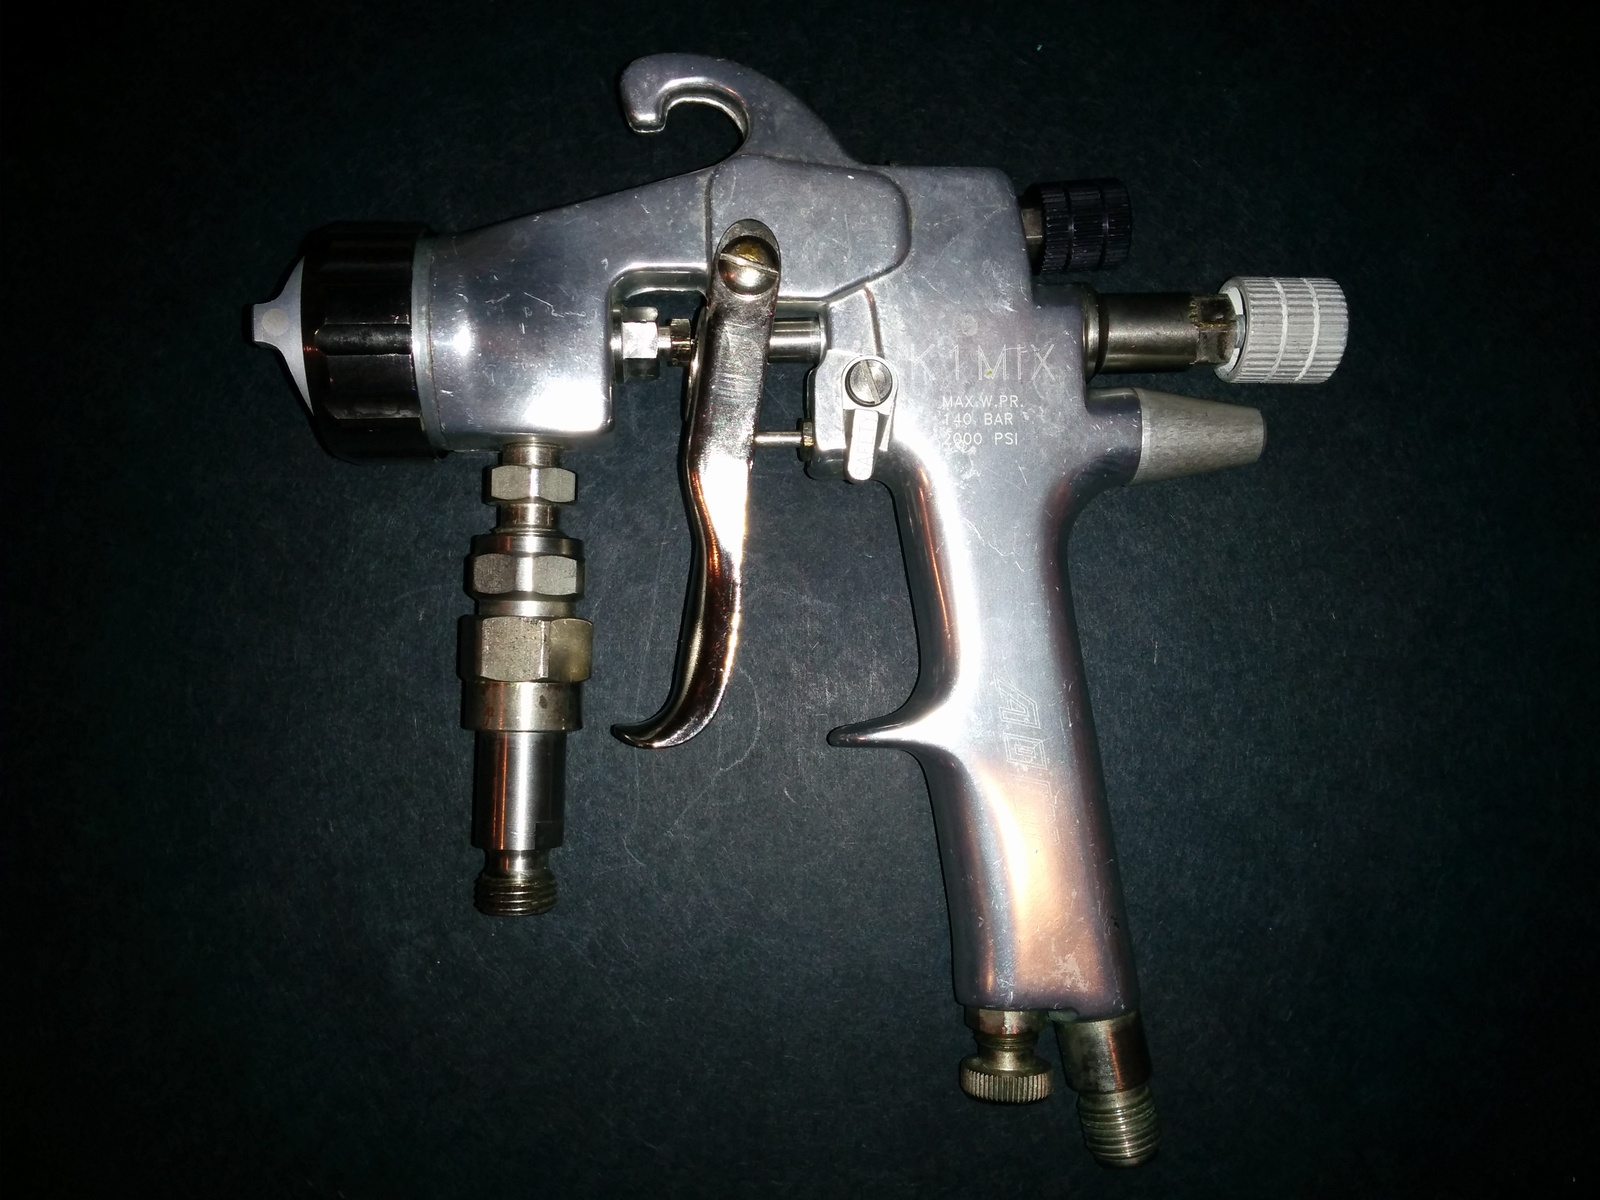 Airless Spraygun Manufacturers Mail: AOM Asturo K1 MIX Air Assisted Airless Spray Gun 25507